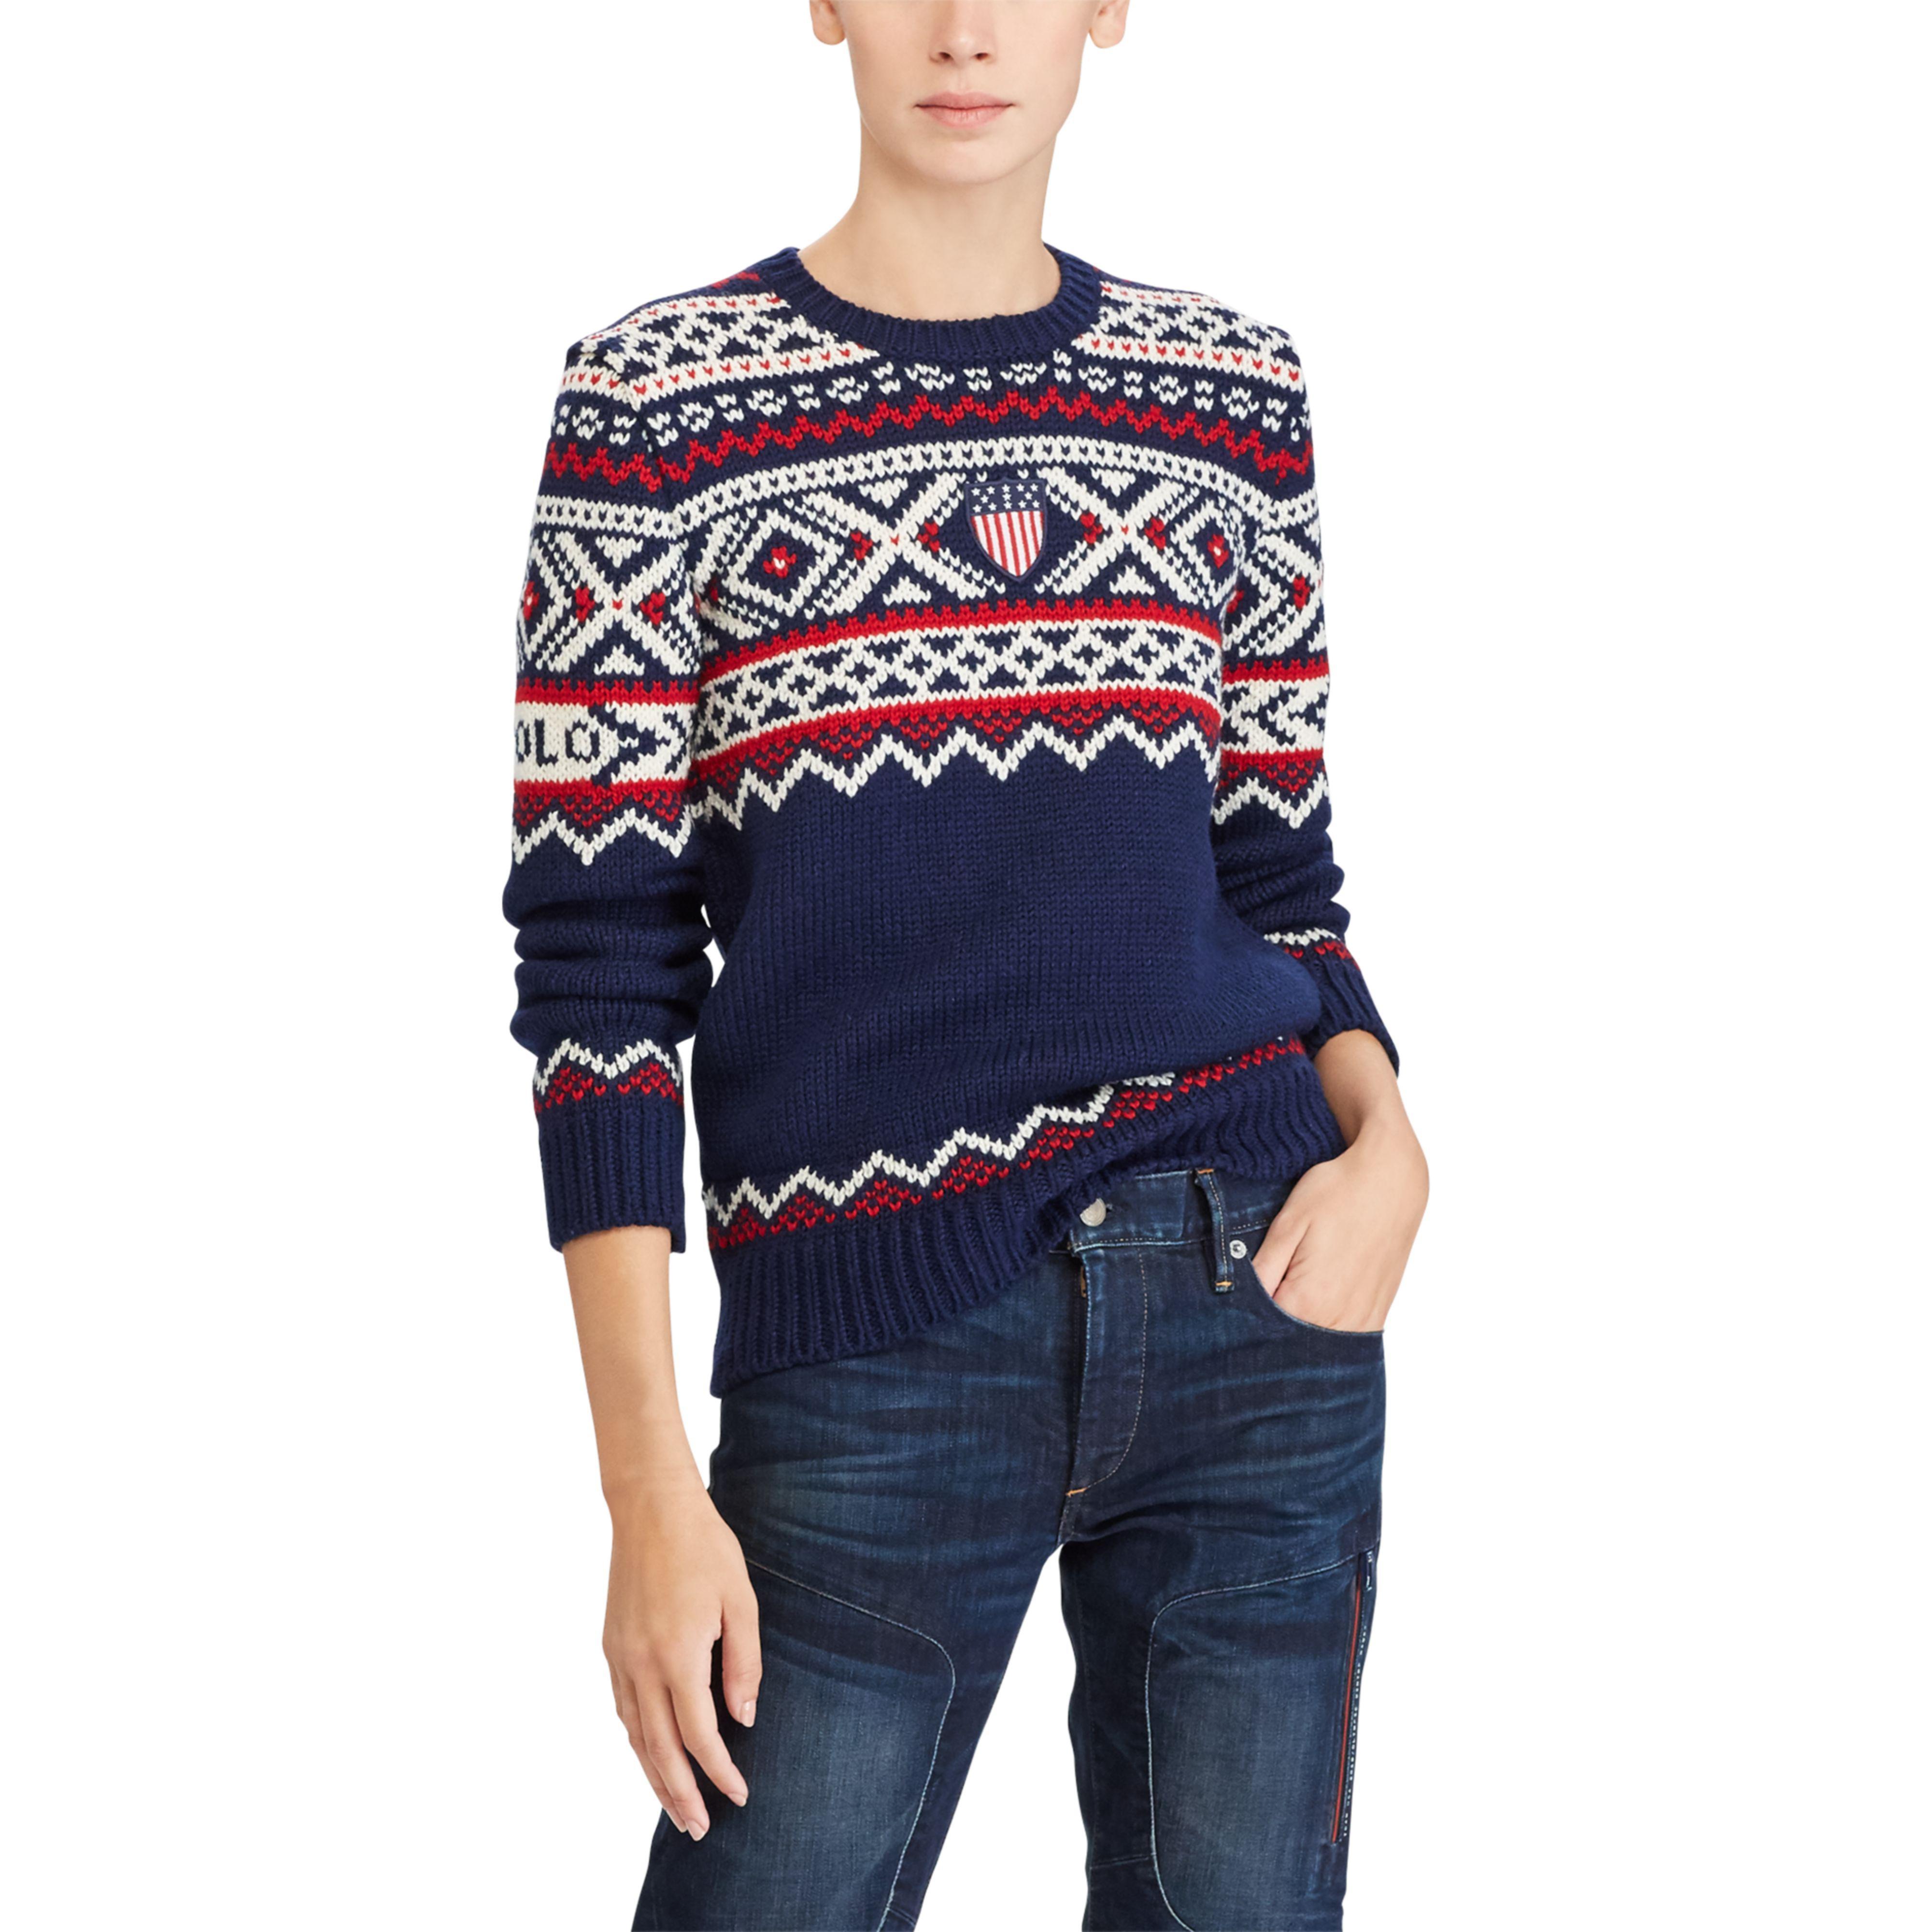 f506fa5dfe Lyst - Polo Ralph Lauren Team Usa Ceremony Sweater in Blue